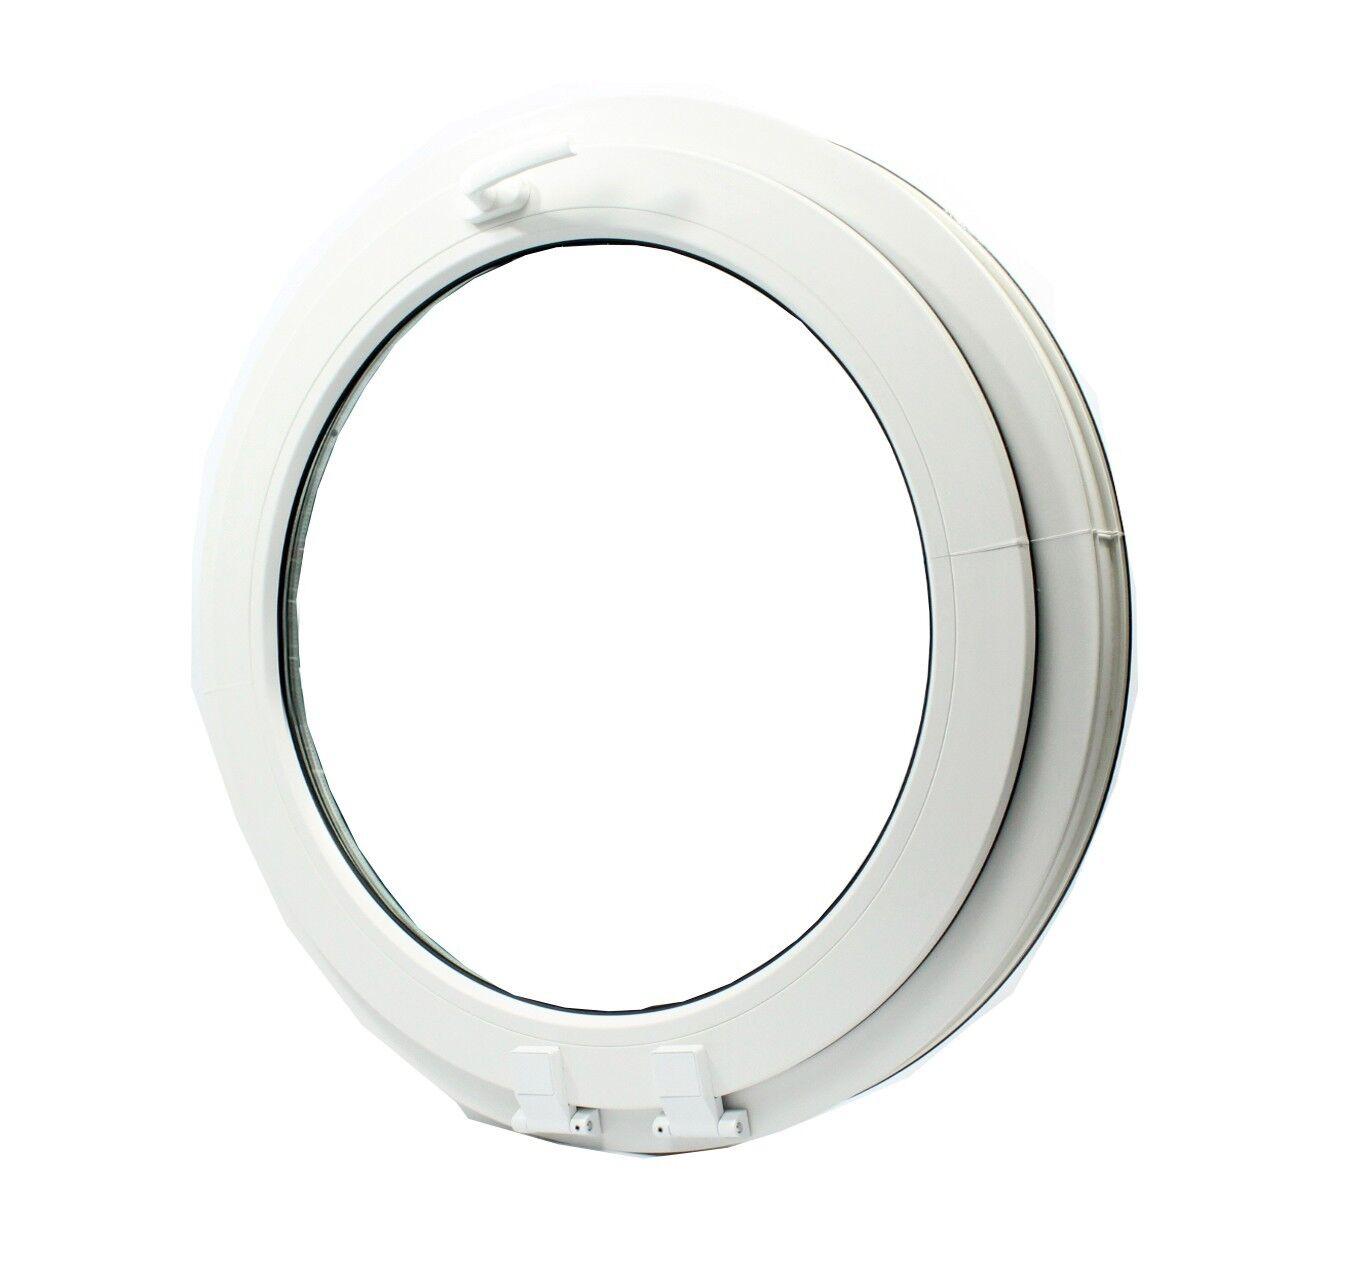 UPVC -Window Round arched circular double glazed VEKA  - handle on top- tilt